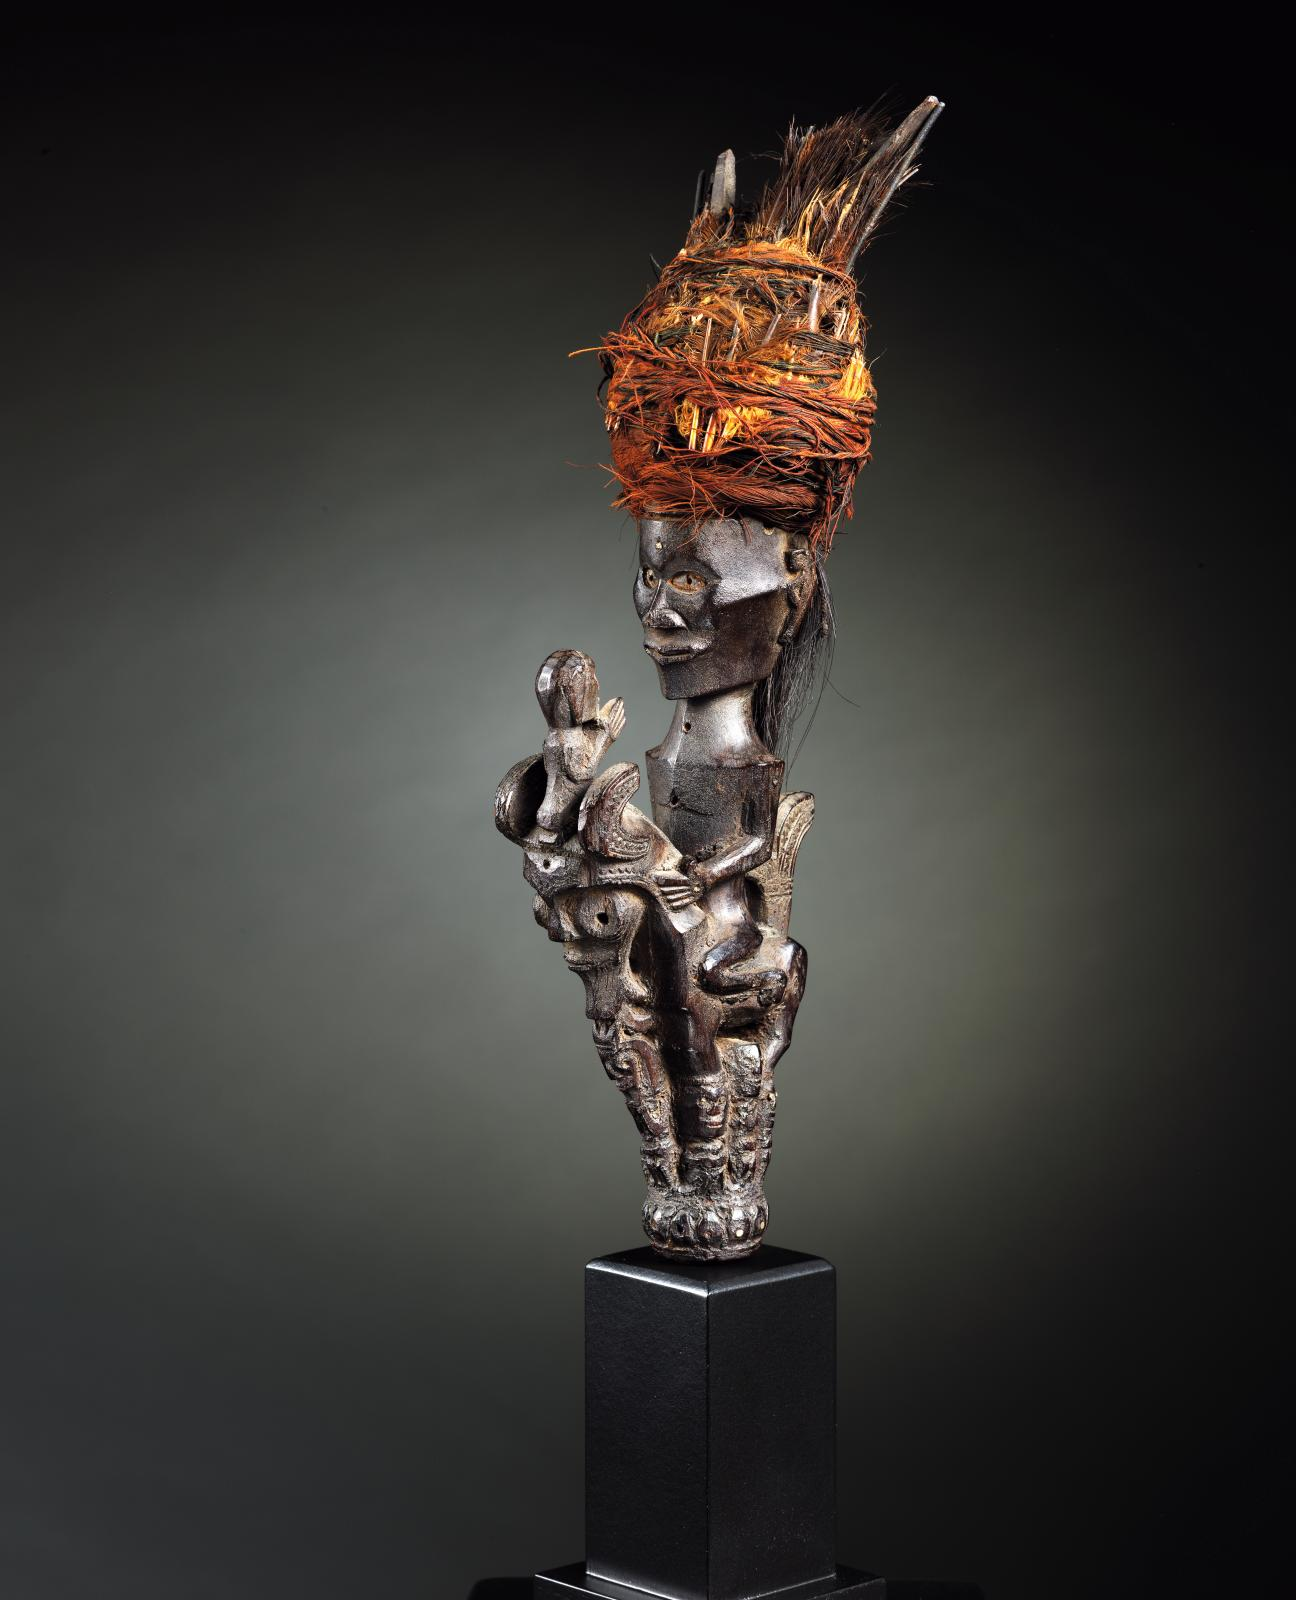 Karo Batak, Sumatra, XVIIIe-XIXesiècle. Sommet d'une canne de chamane tungkot malehat, bois, coton, cheveux, plumes, h.32,8cm. Galerie Thomas Murra